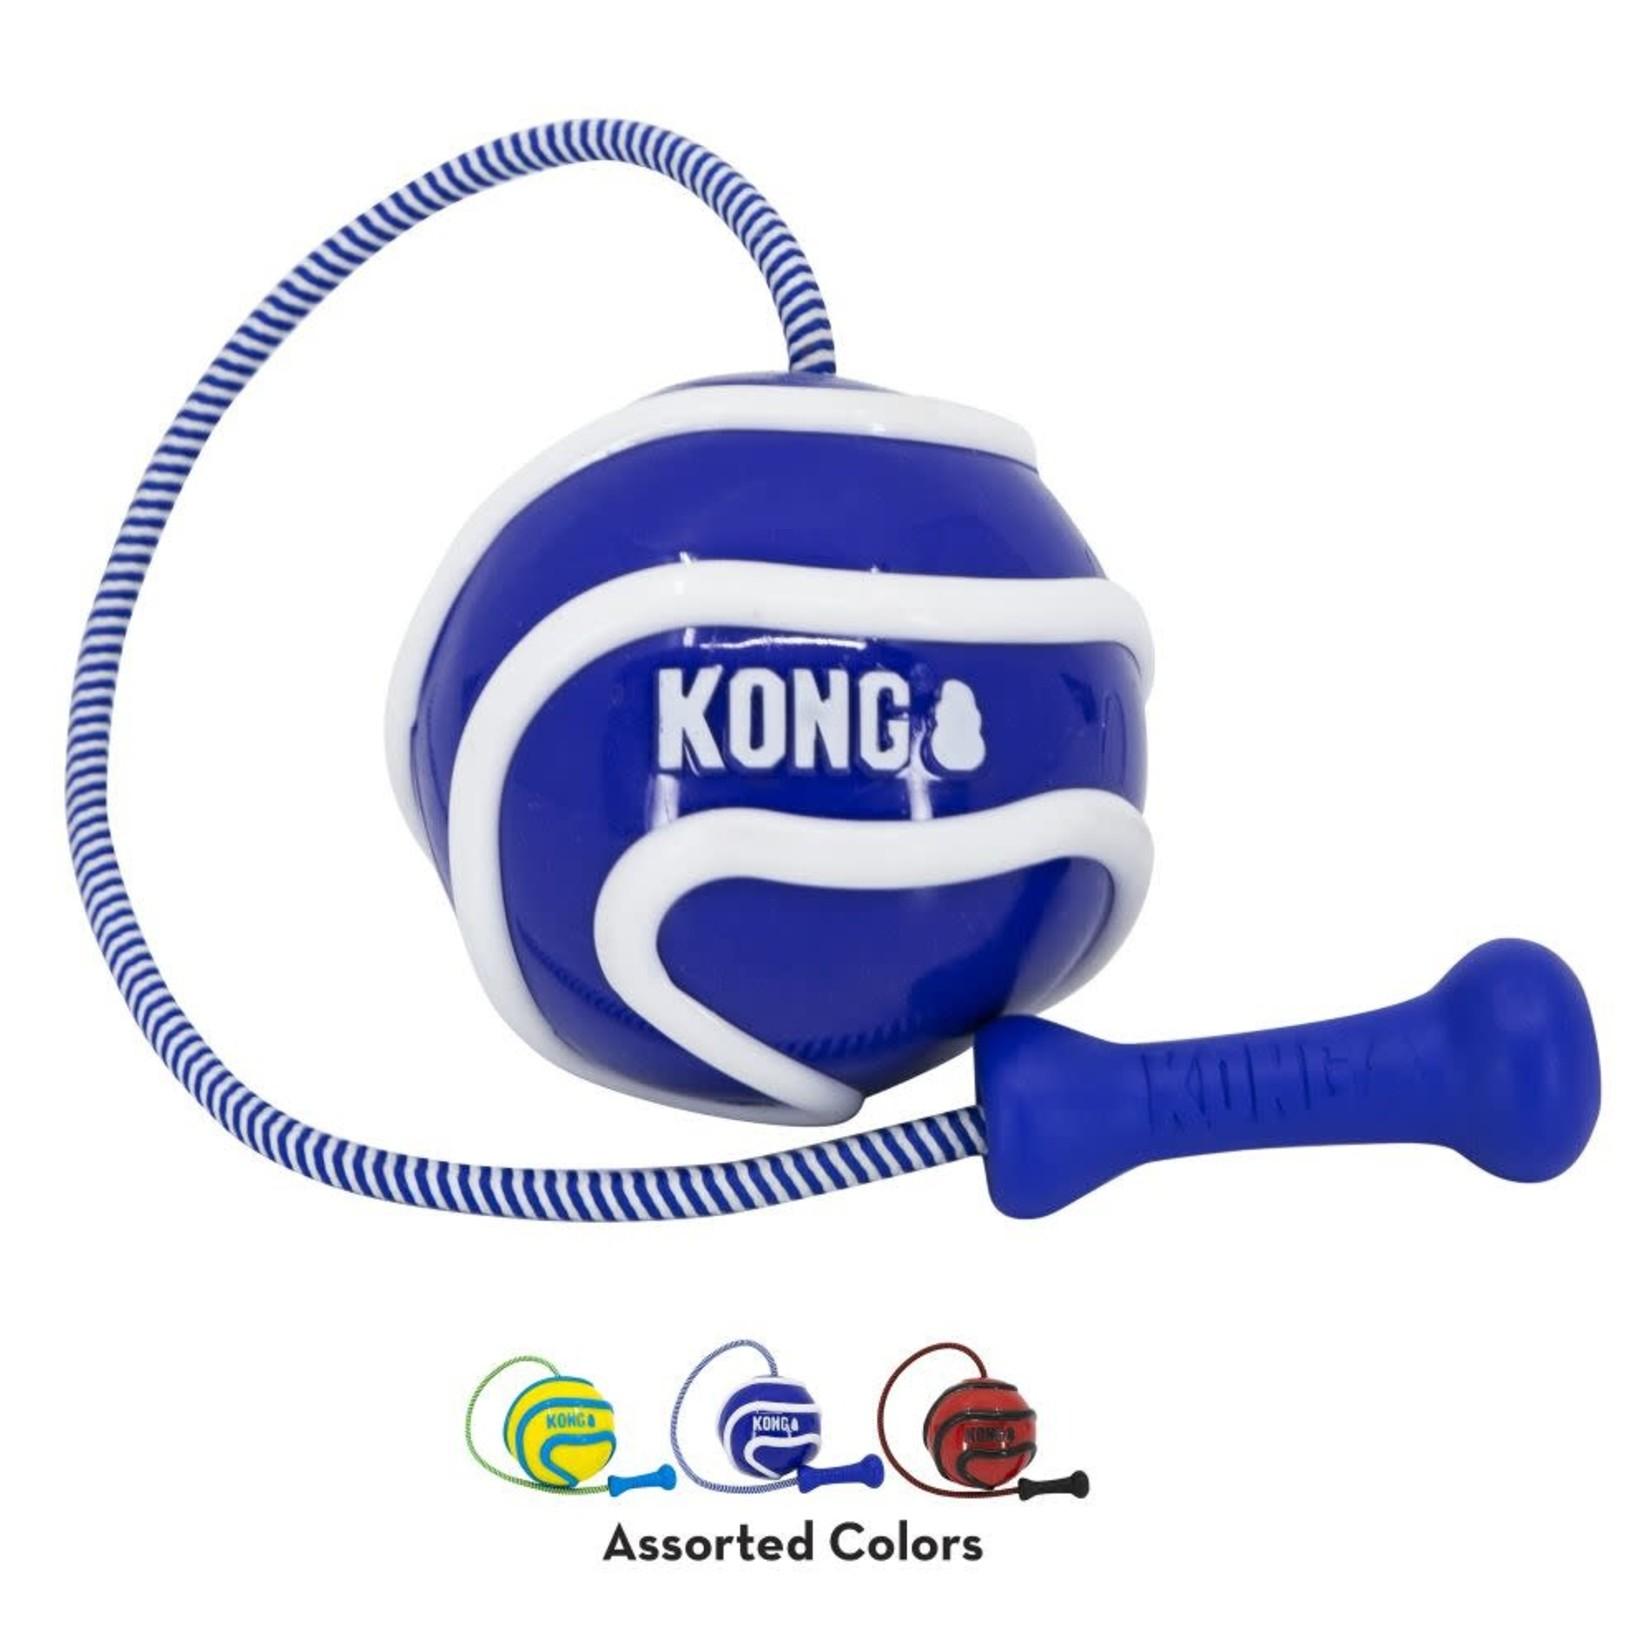 KONG Bunjiball Retrieval Dog Toy, Large